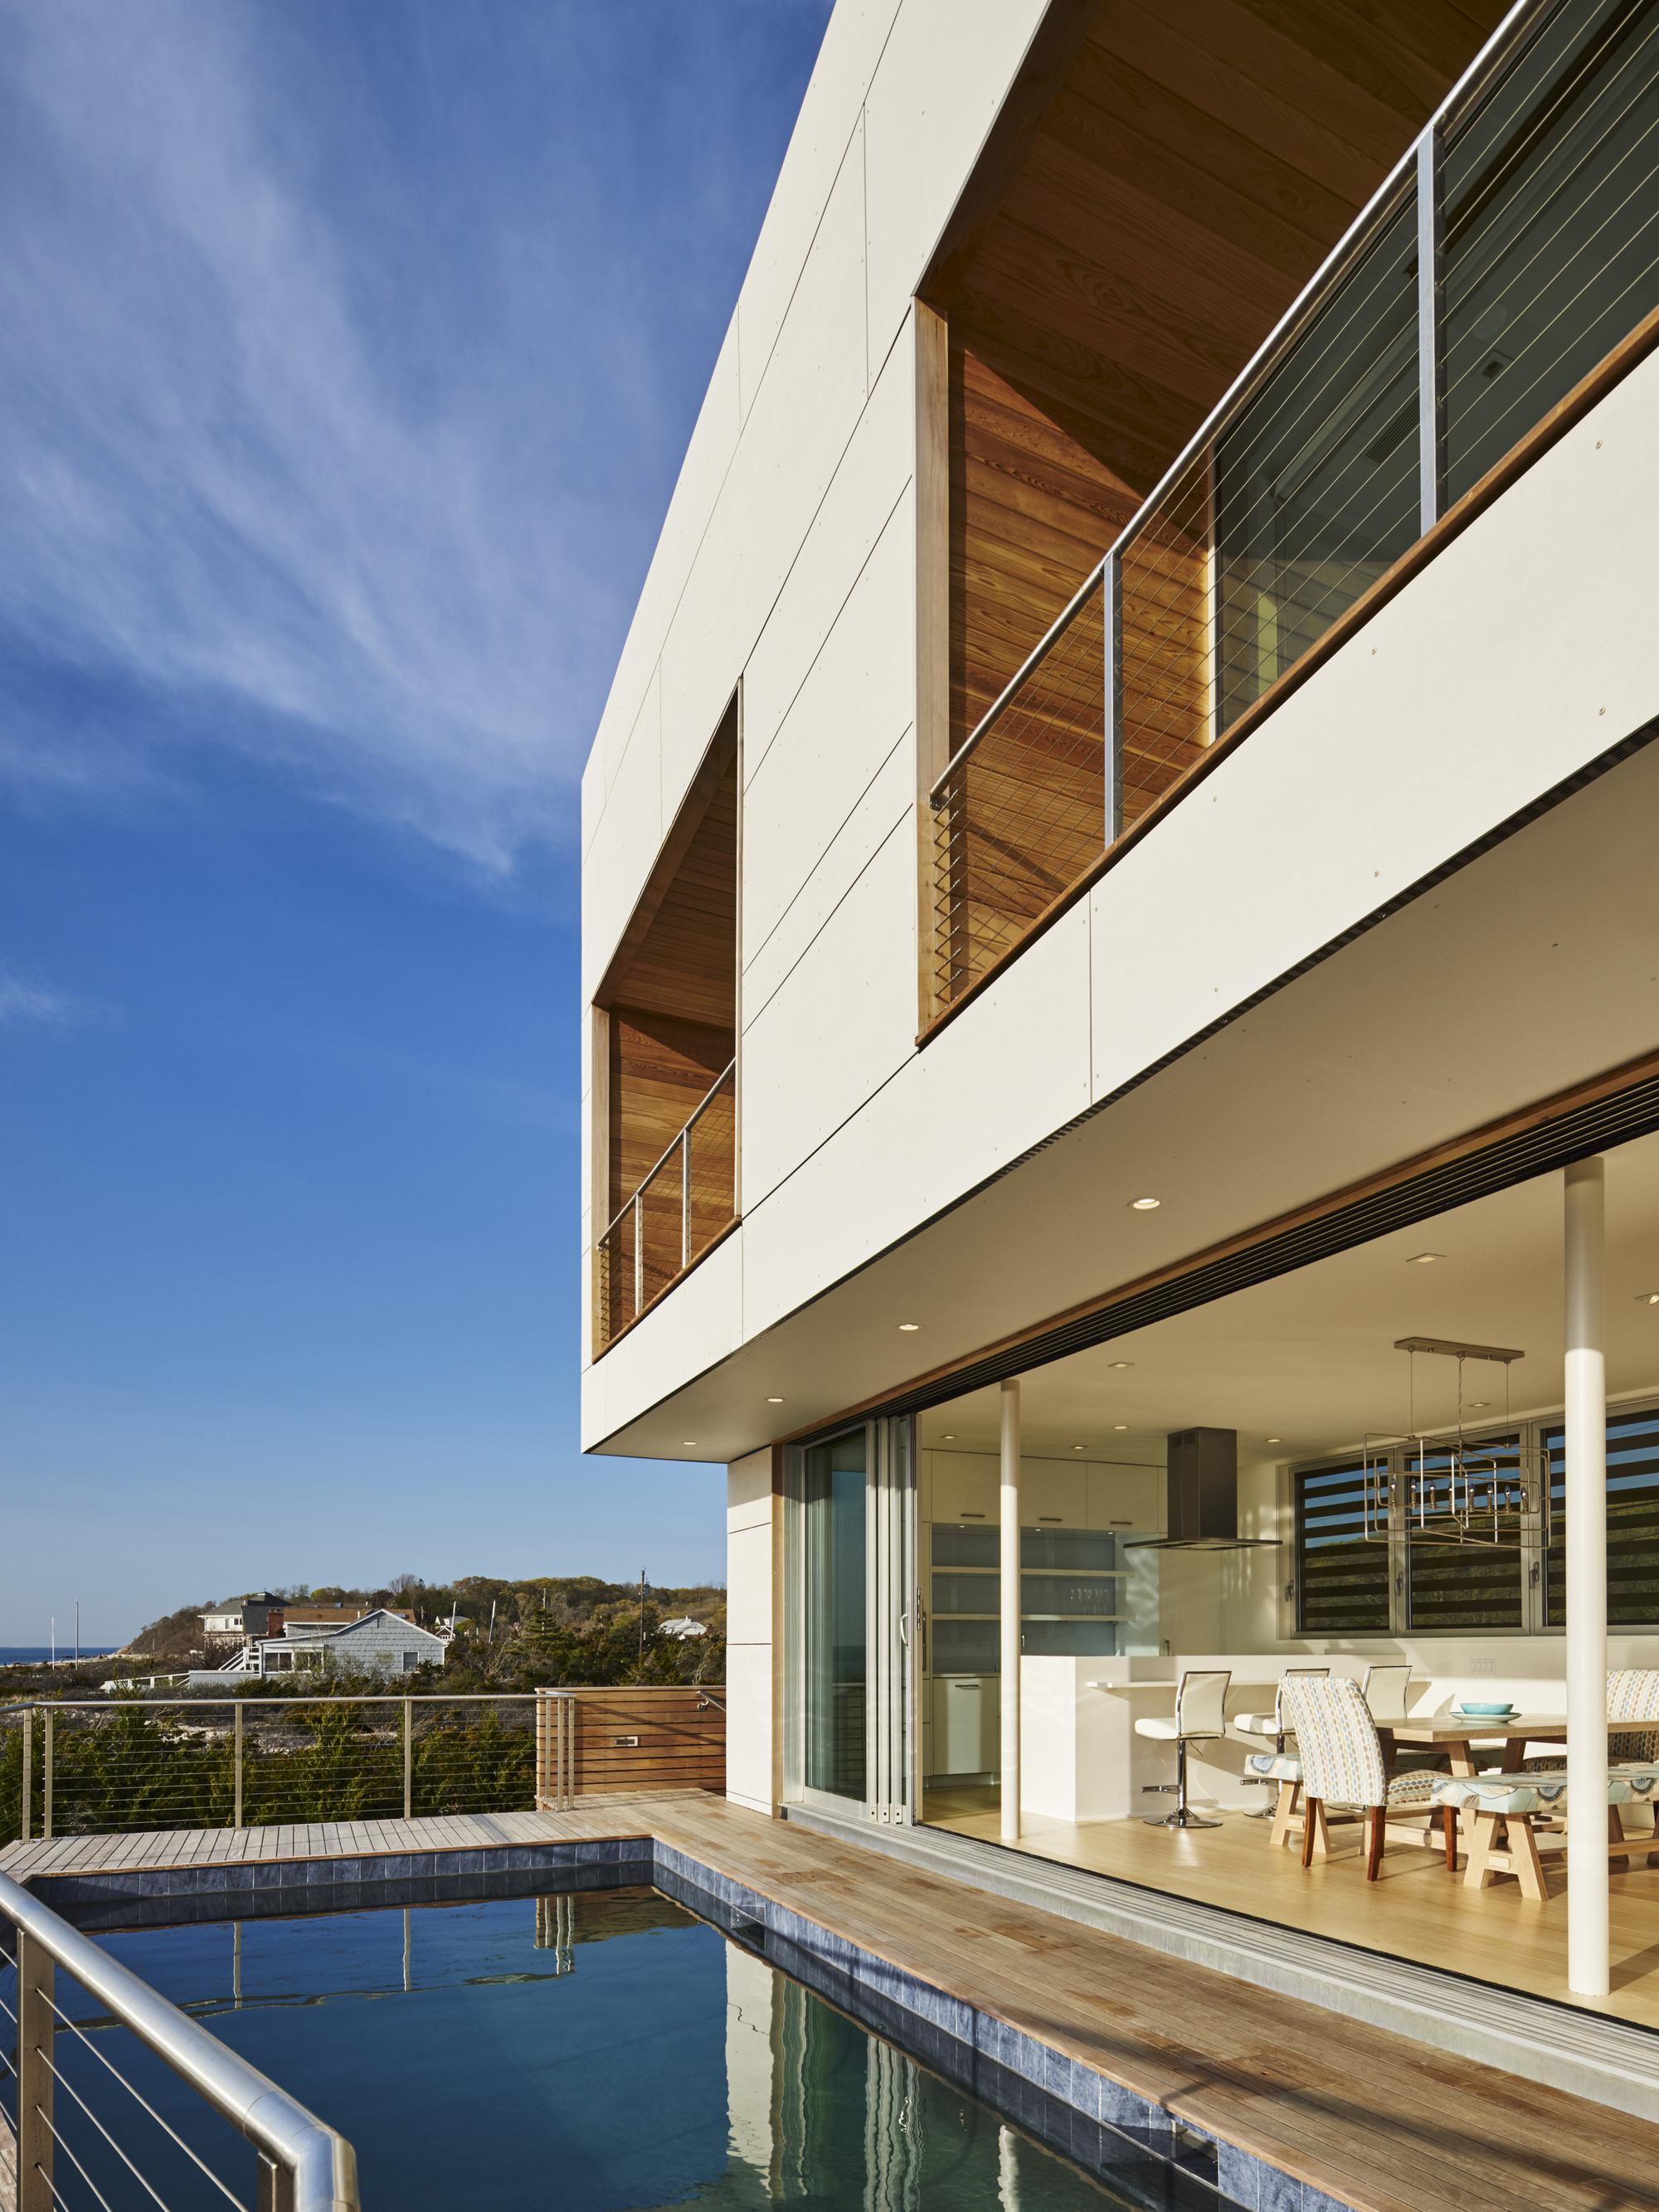 galer a de mar del norte berg design architecture 6. Black Bedroom Furniture Sets. Home Design Ideas